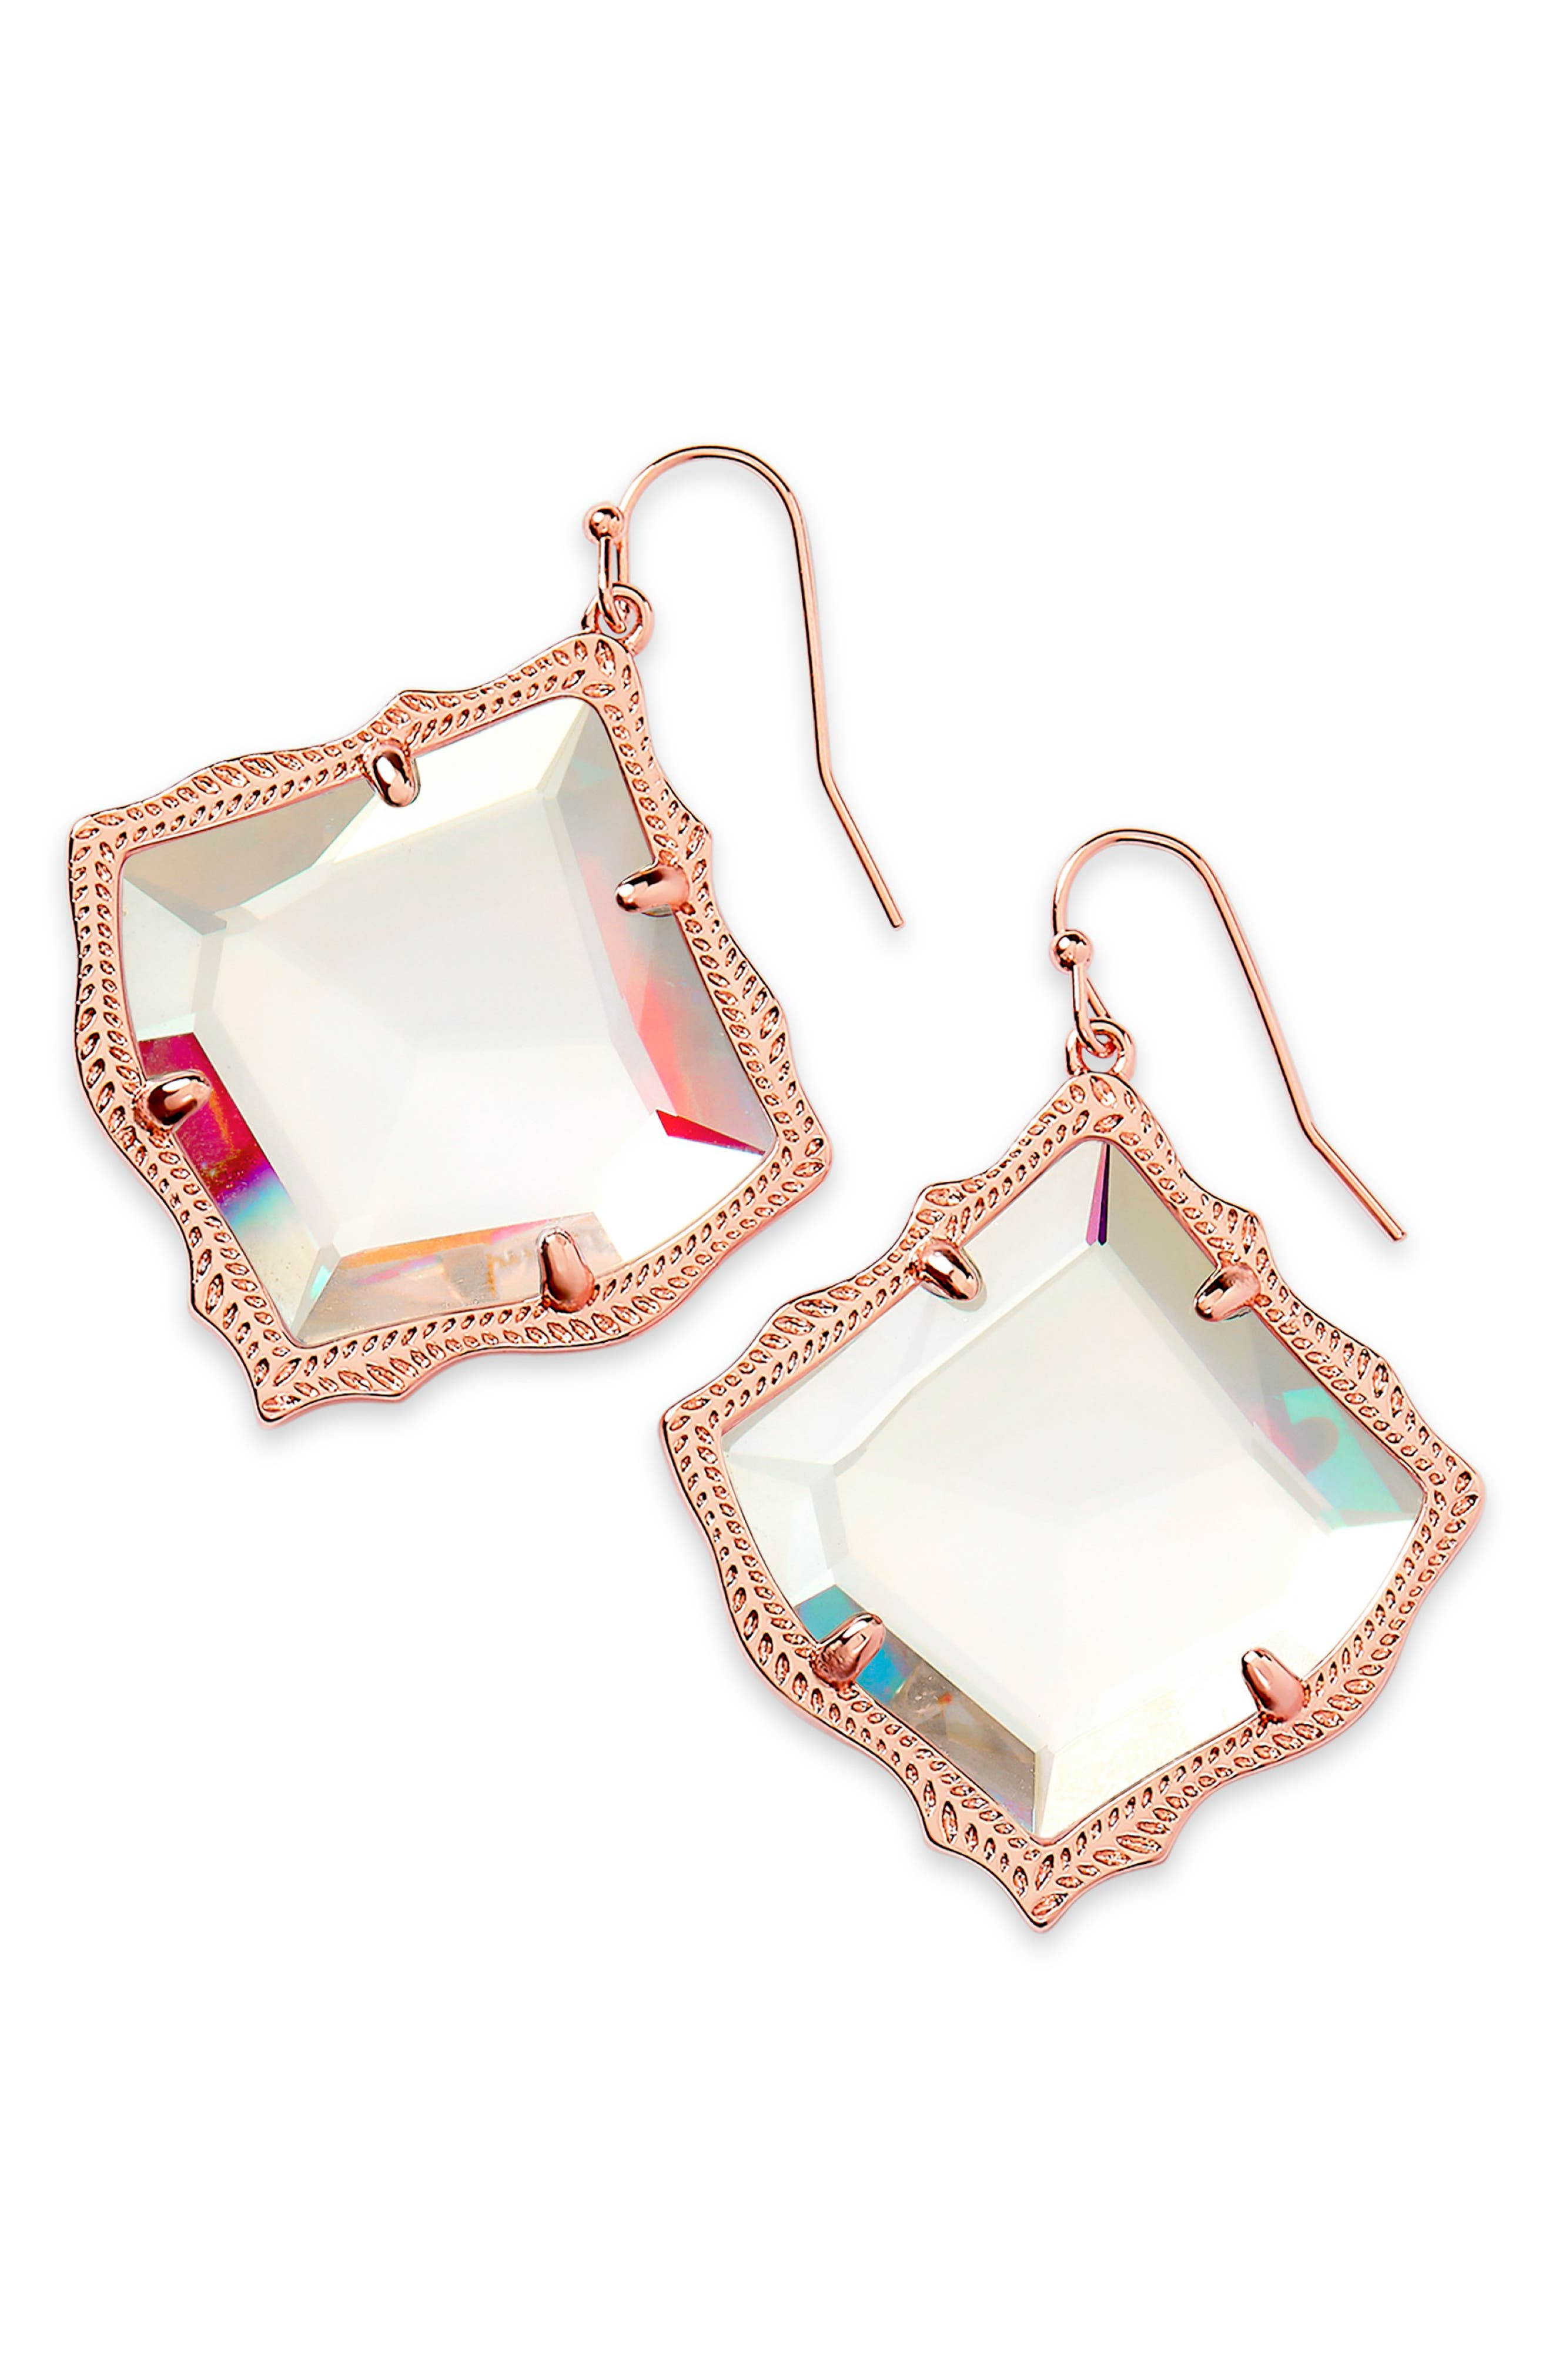 KENDRA SCOTT, Kirsten Drop Earrings, Main thumbnail 1, color, DICHROIC GLASS/ ROSE GOLD